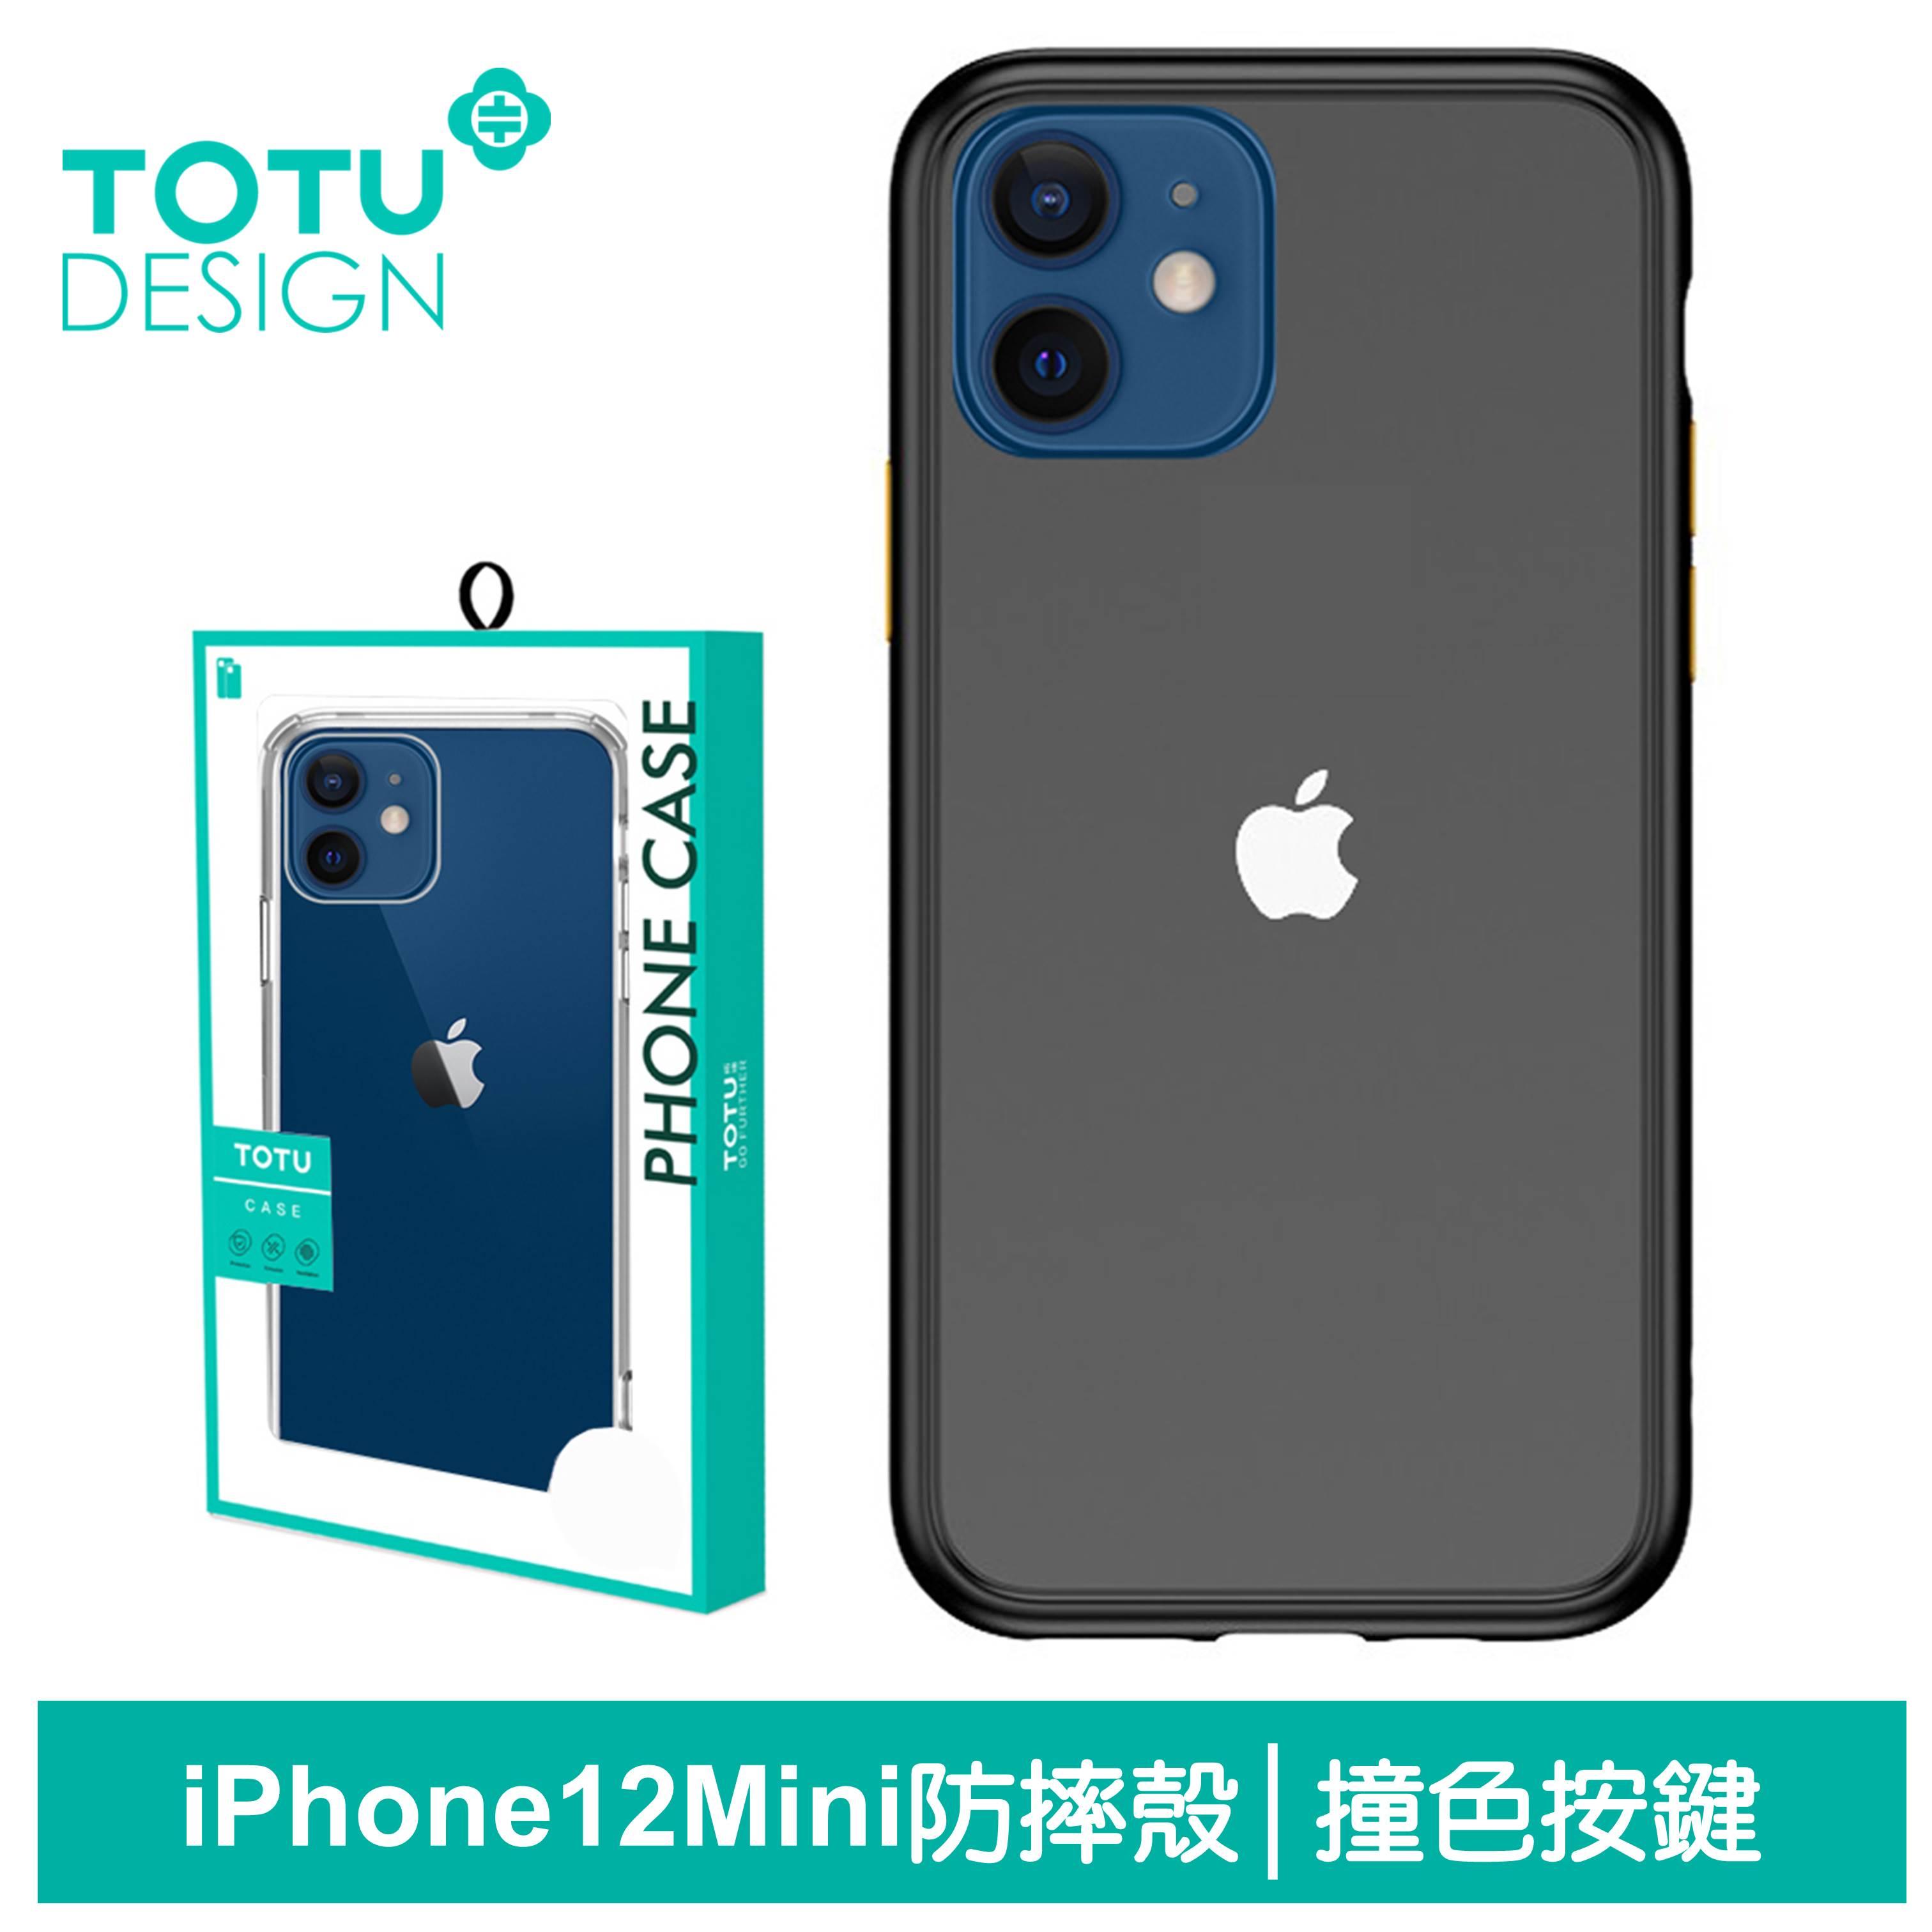 TOTU台灣官方 iPhone 12 Mini 手機殼 i12 Mini 保護殼 5.4吋 防摔殼 撞色按鍵 晶剛系列 黑色